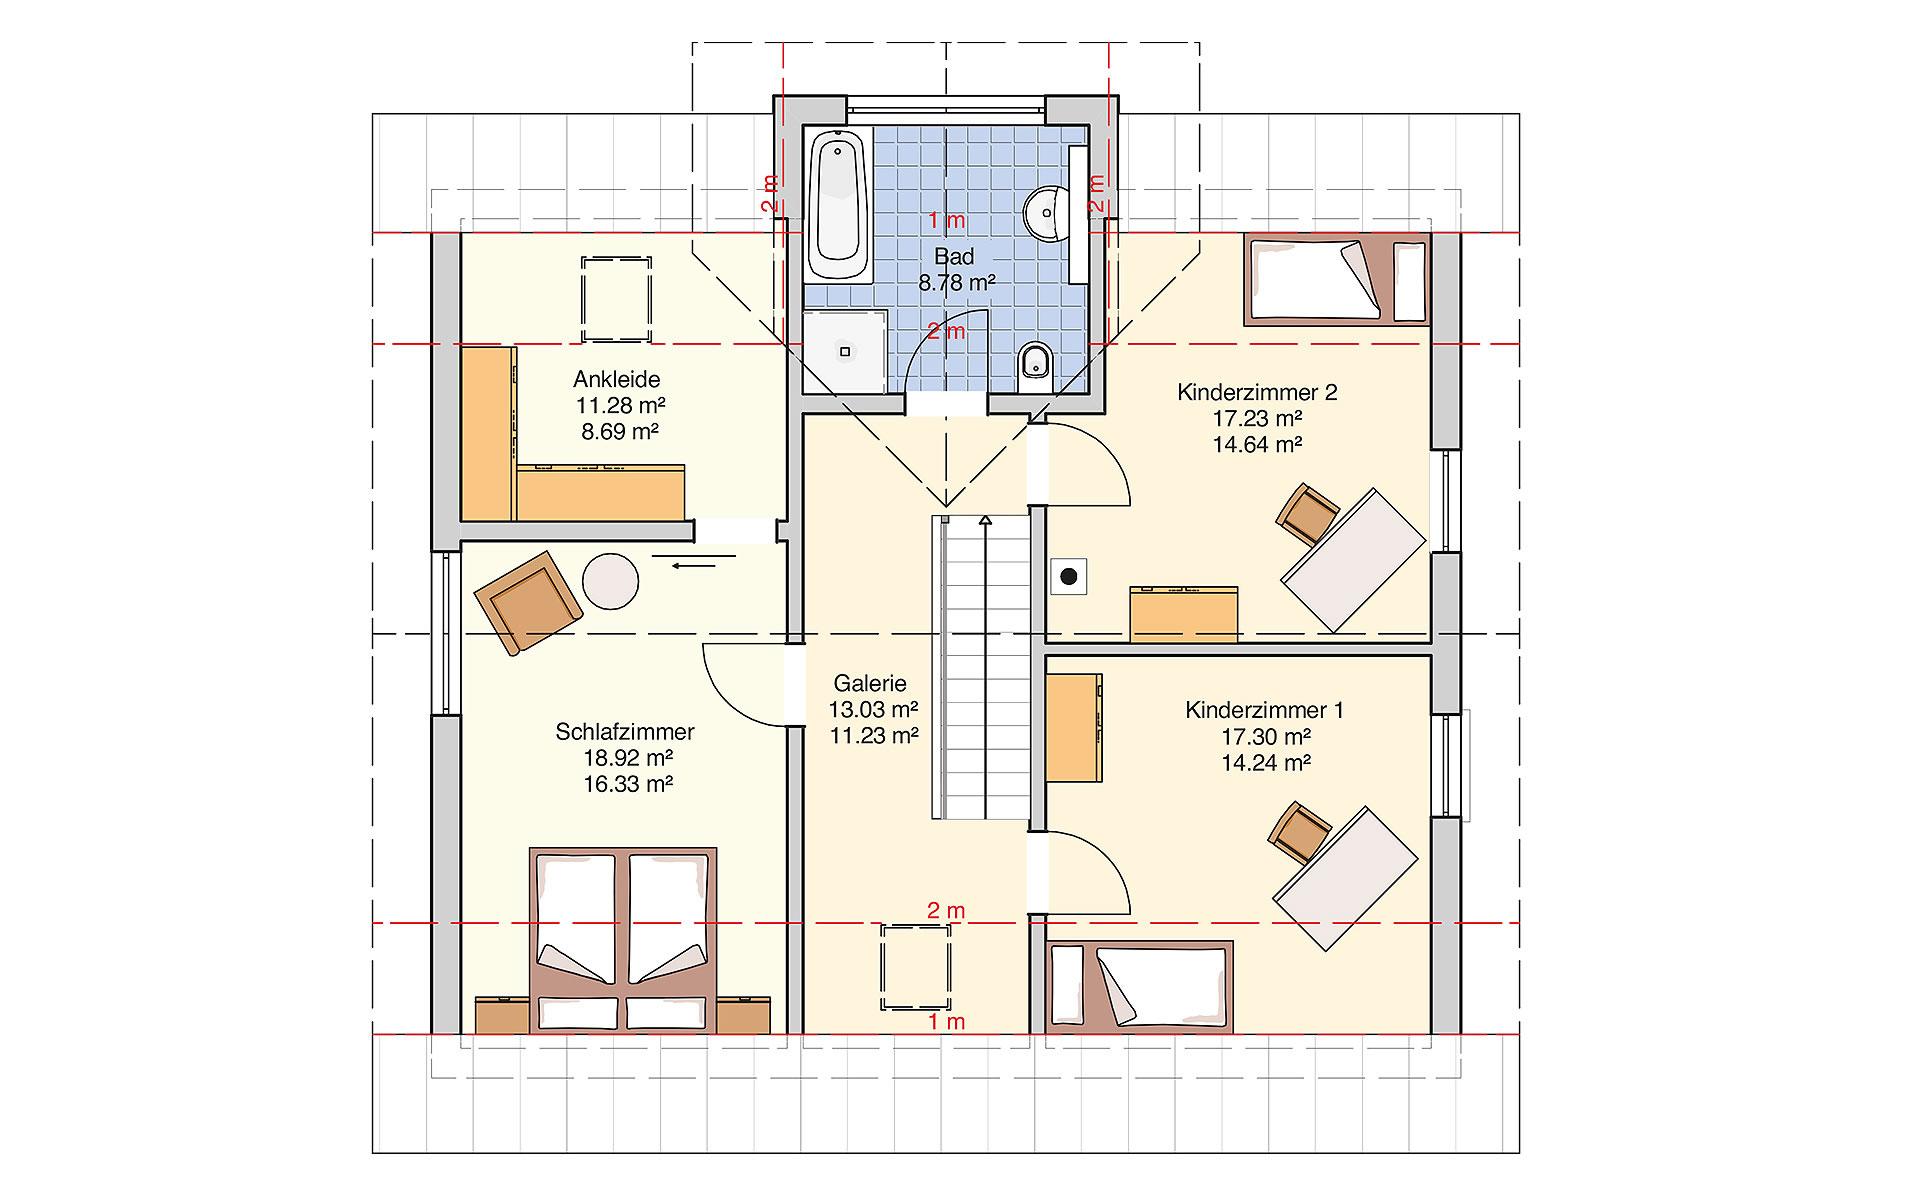 Dachgeschoss Solera von Fingerhut Haus GmbH & Co. KG